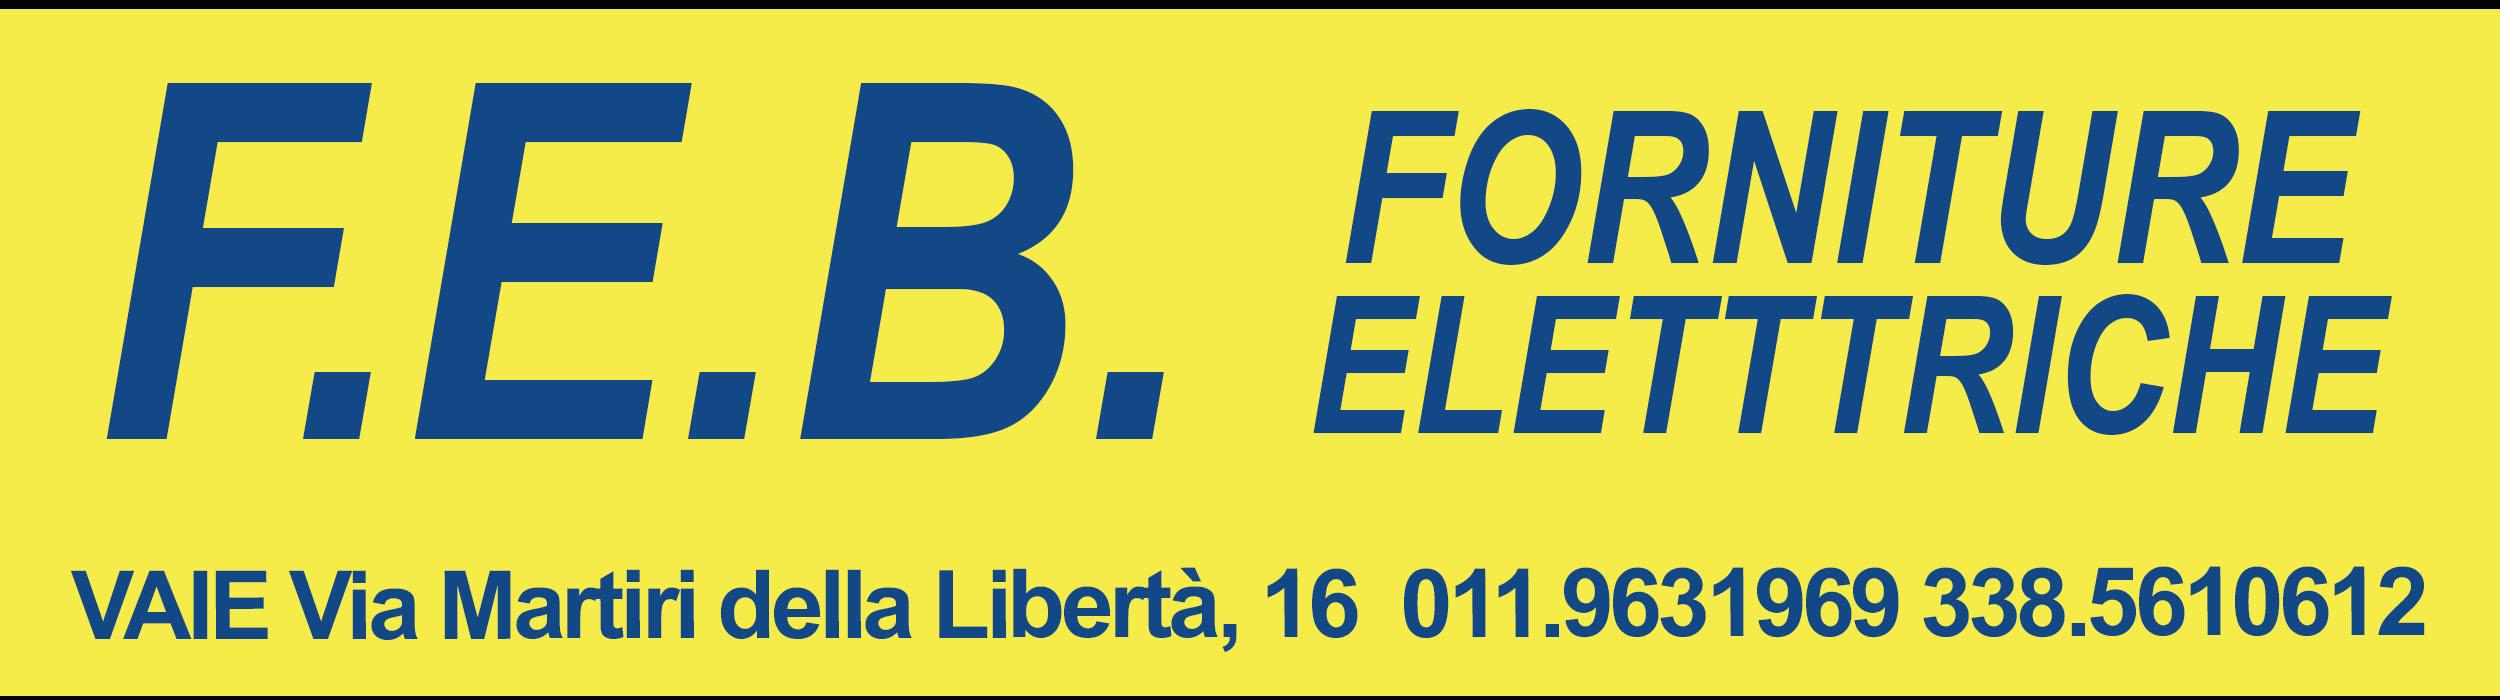 feb banner